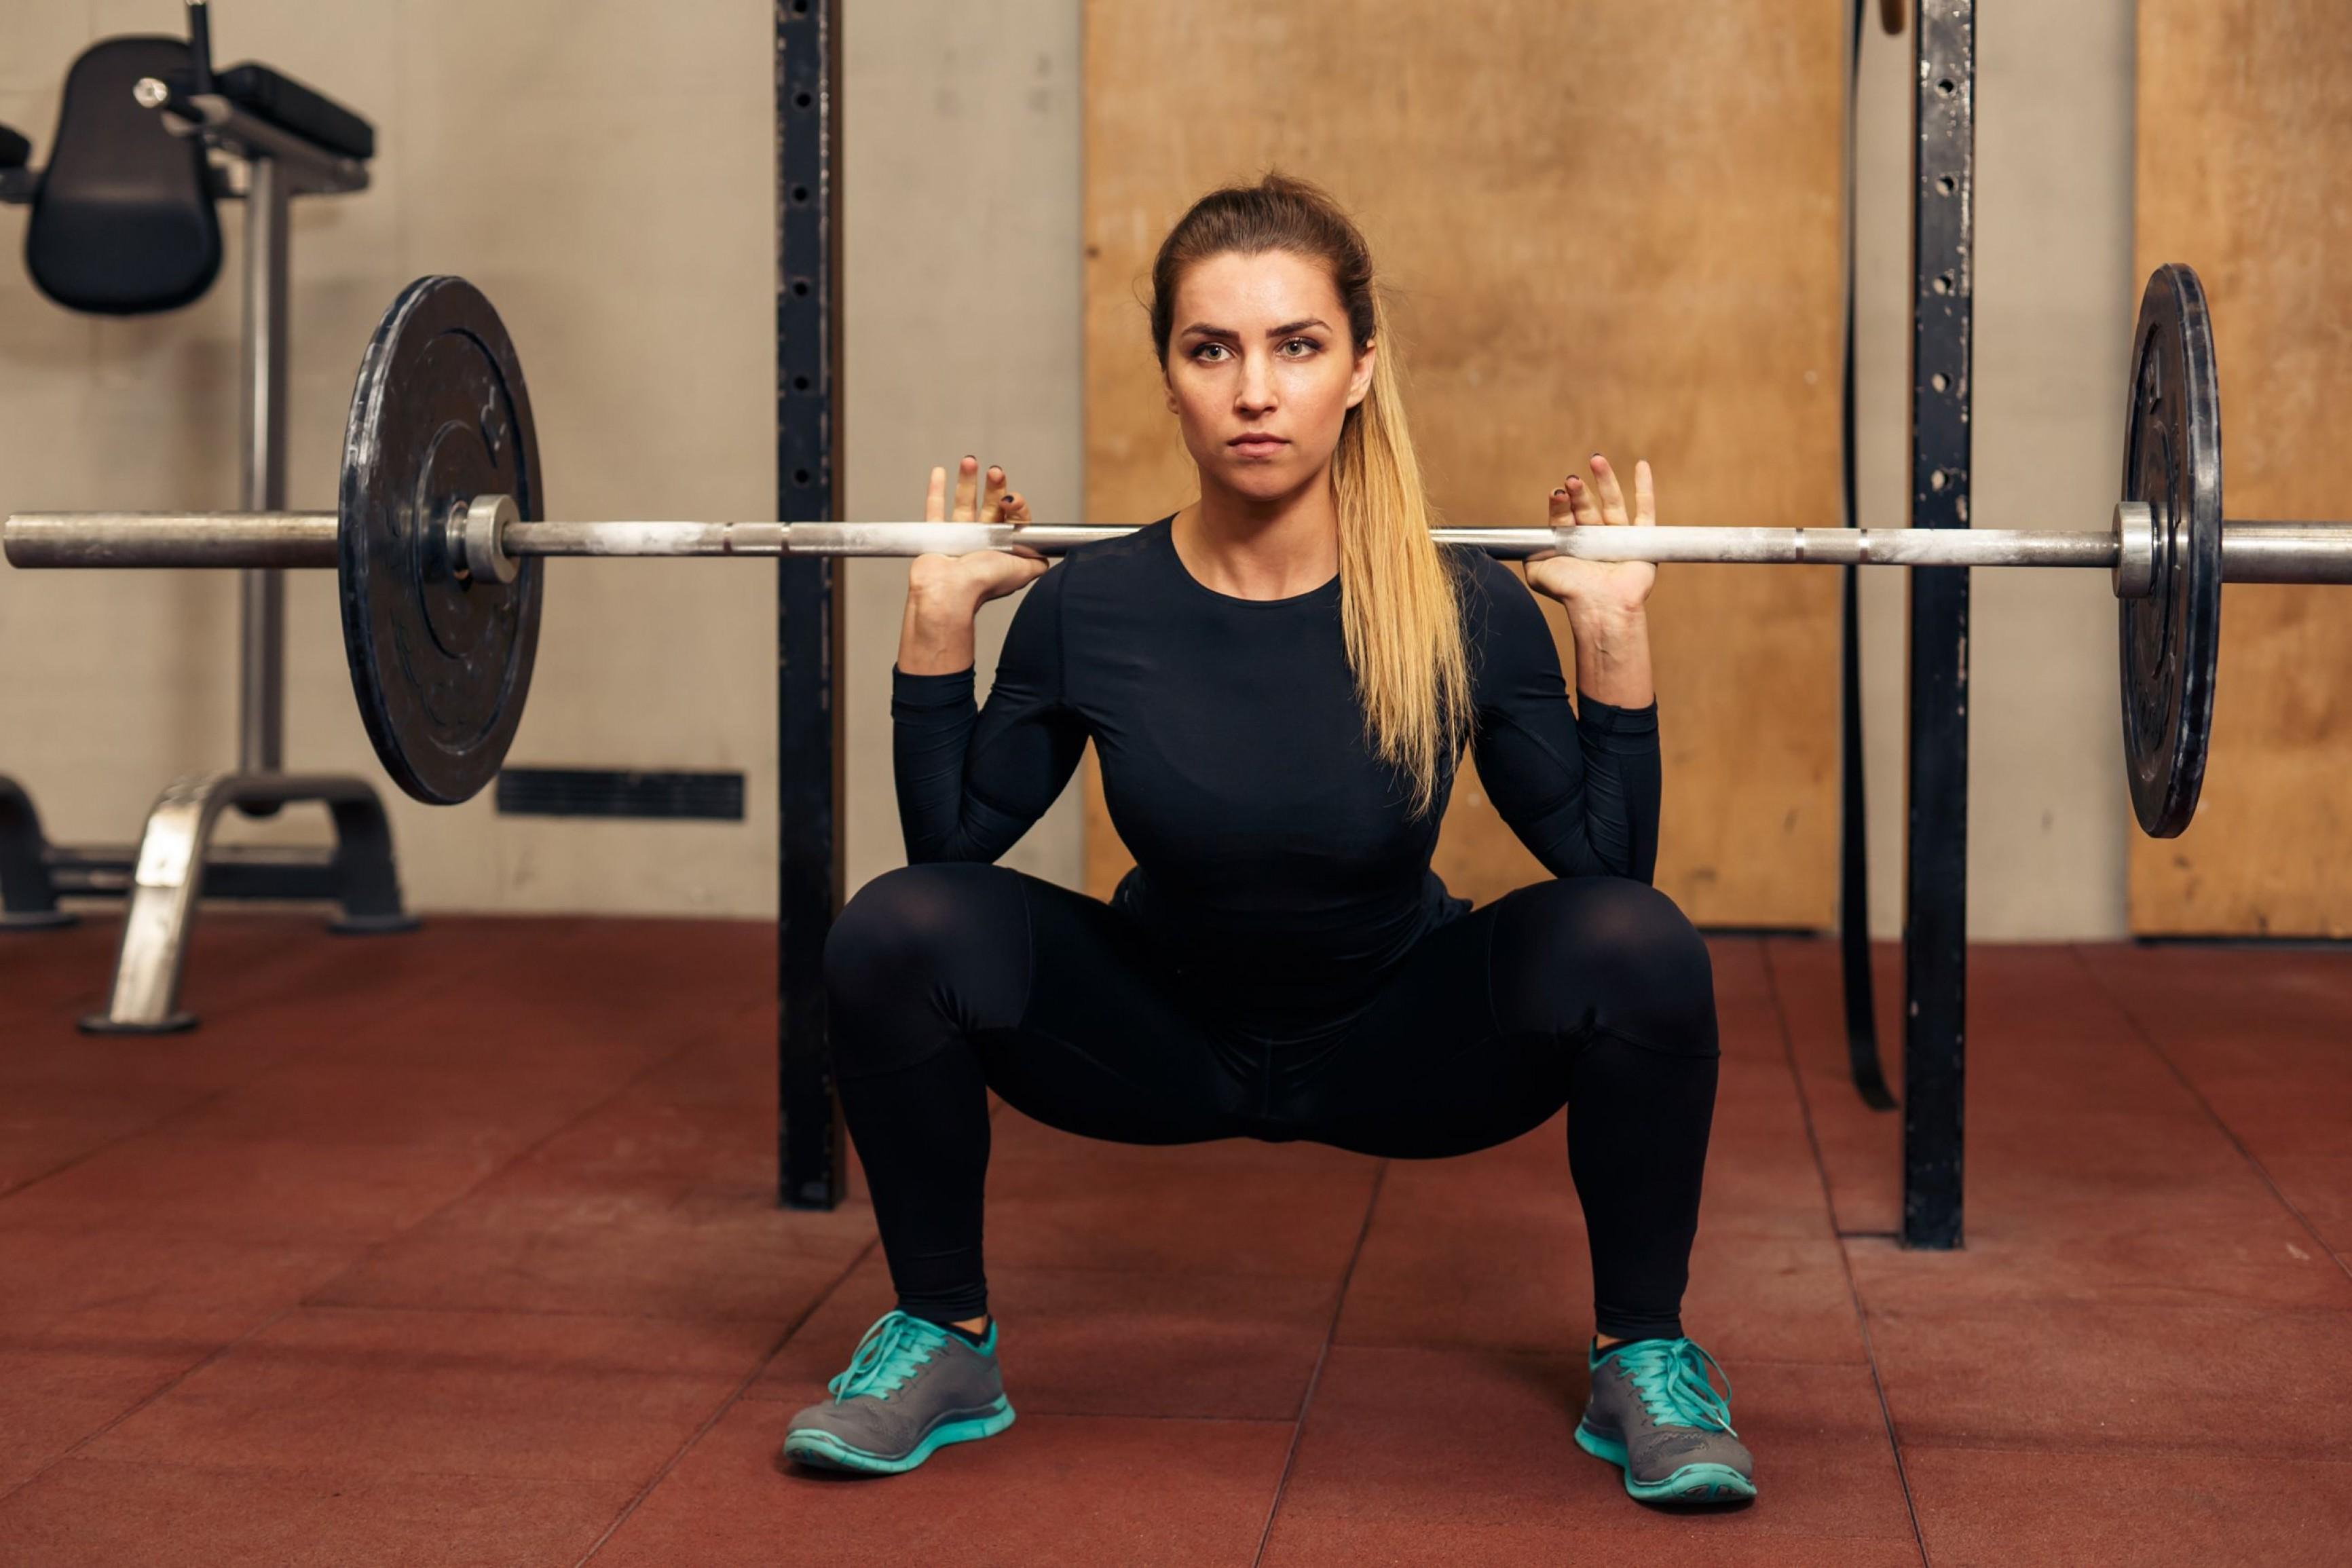 Wallpaper Girl, fitness, exercise, gym, dumbbells, workout ...